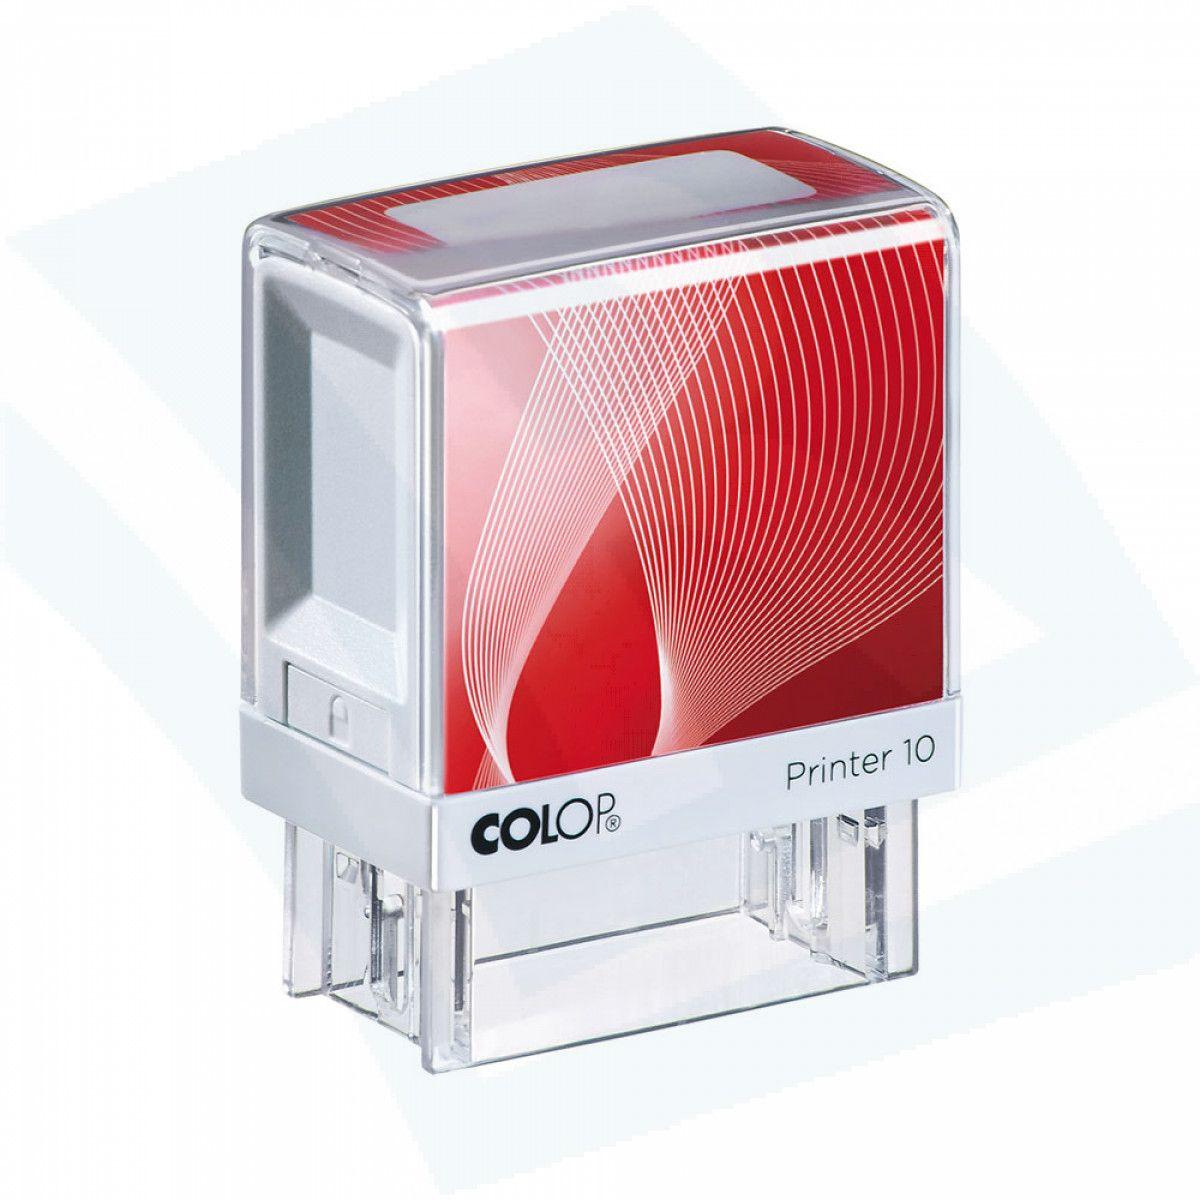 Razítko COLOP Printer 10